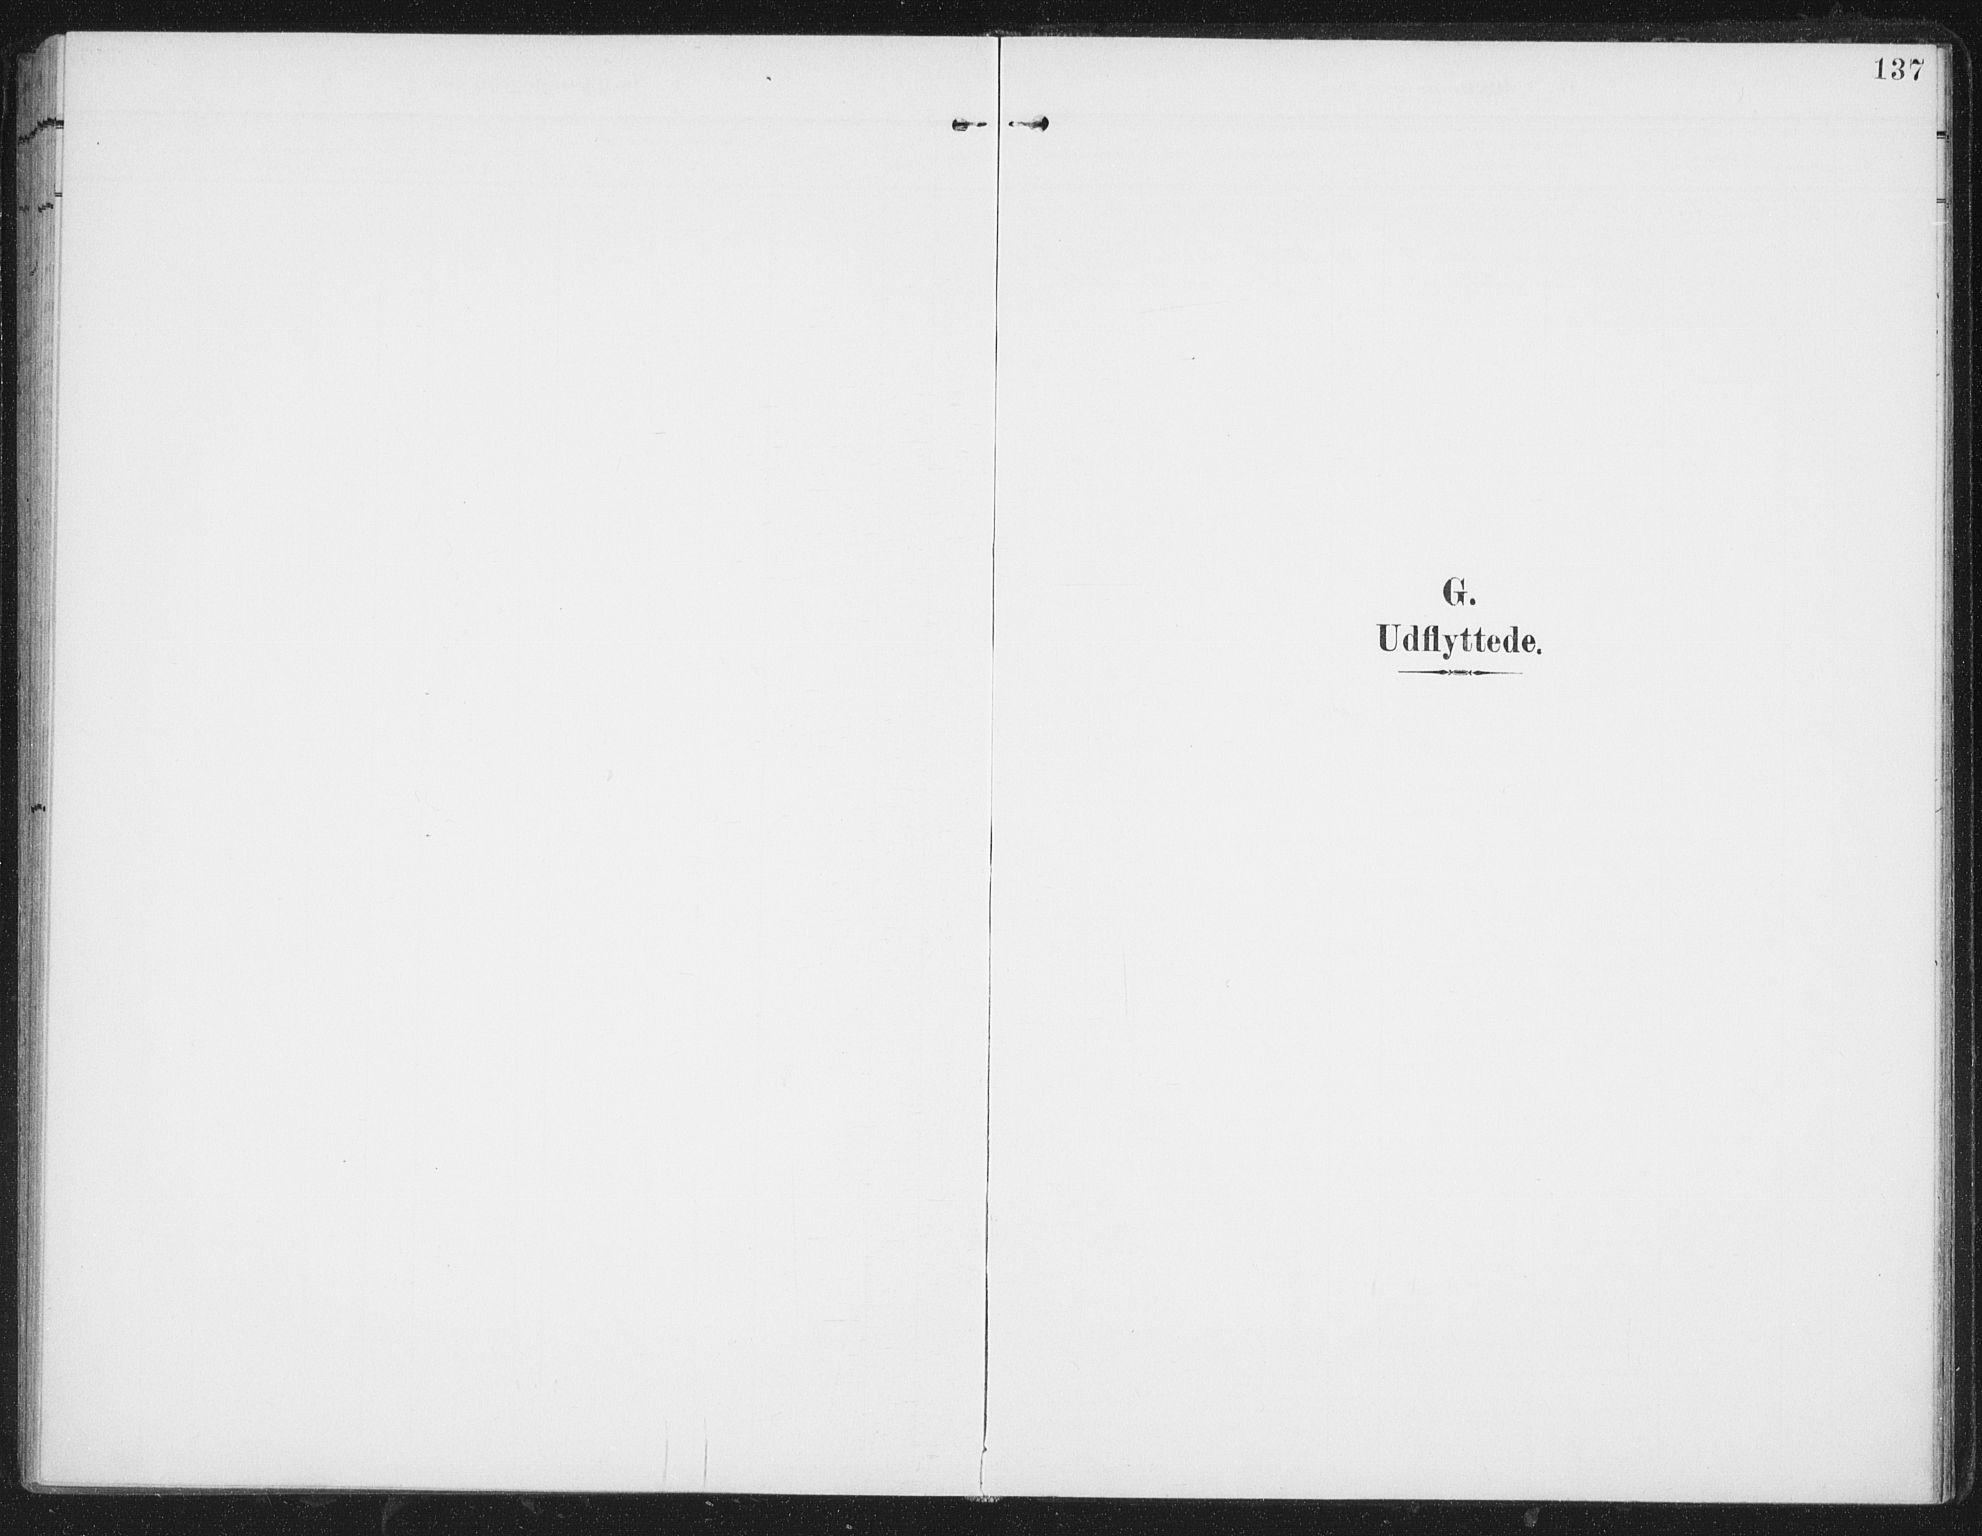 SAT, Ministerialprotokoller, klokkerbøker og fødselsregistre - Nordland, 827/L0403: Ministerialbok nr. 827A15, 1903-1912, s. 137